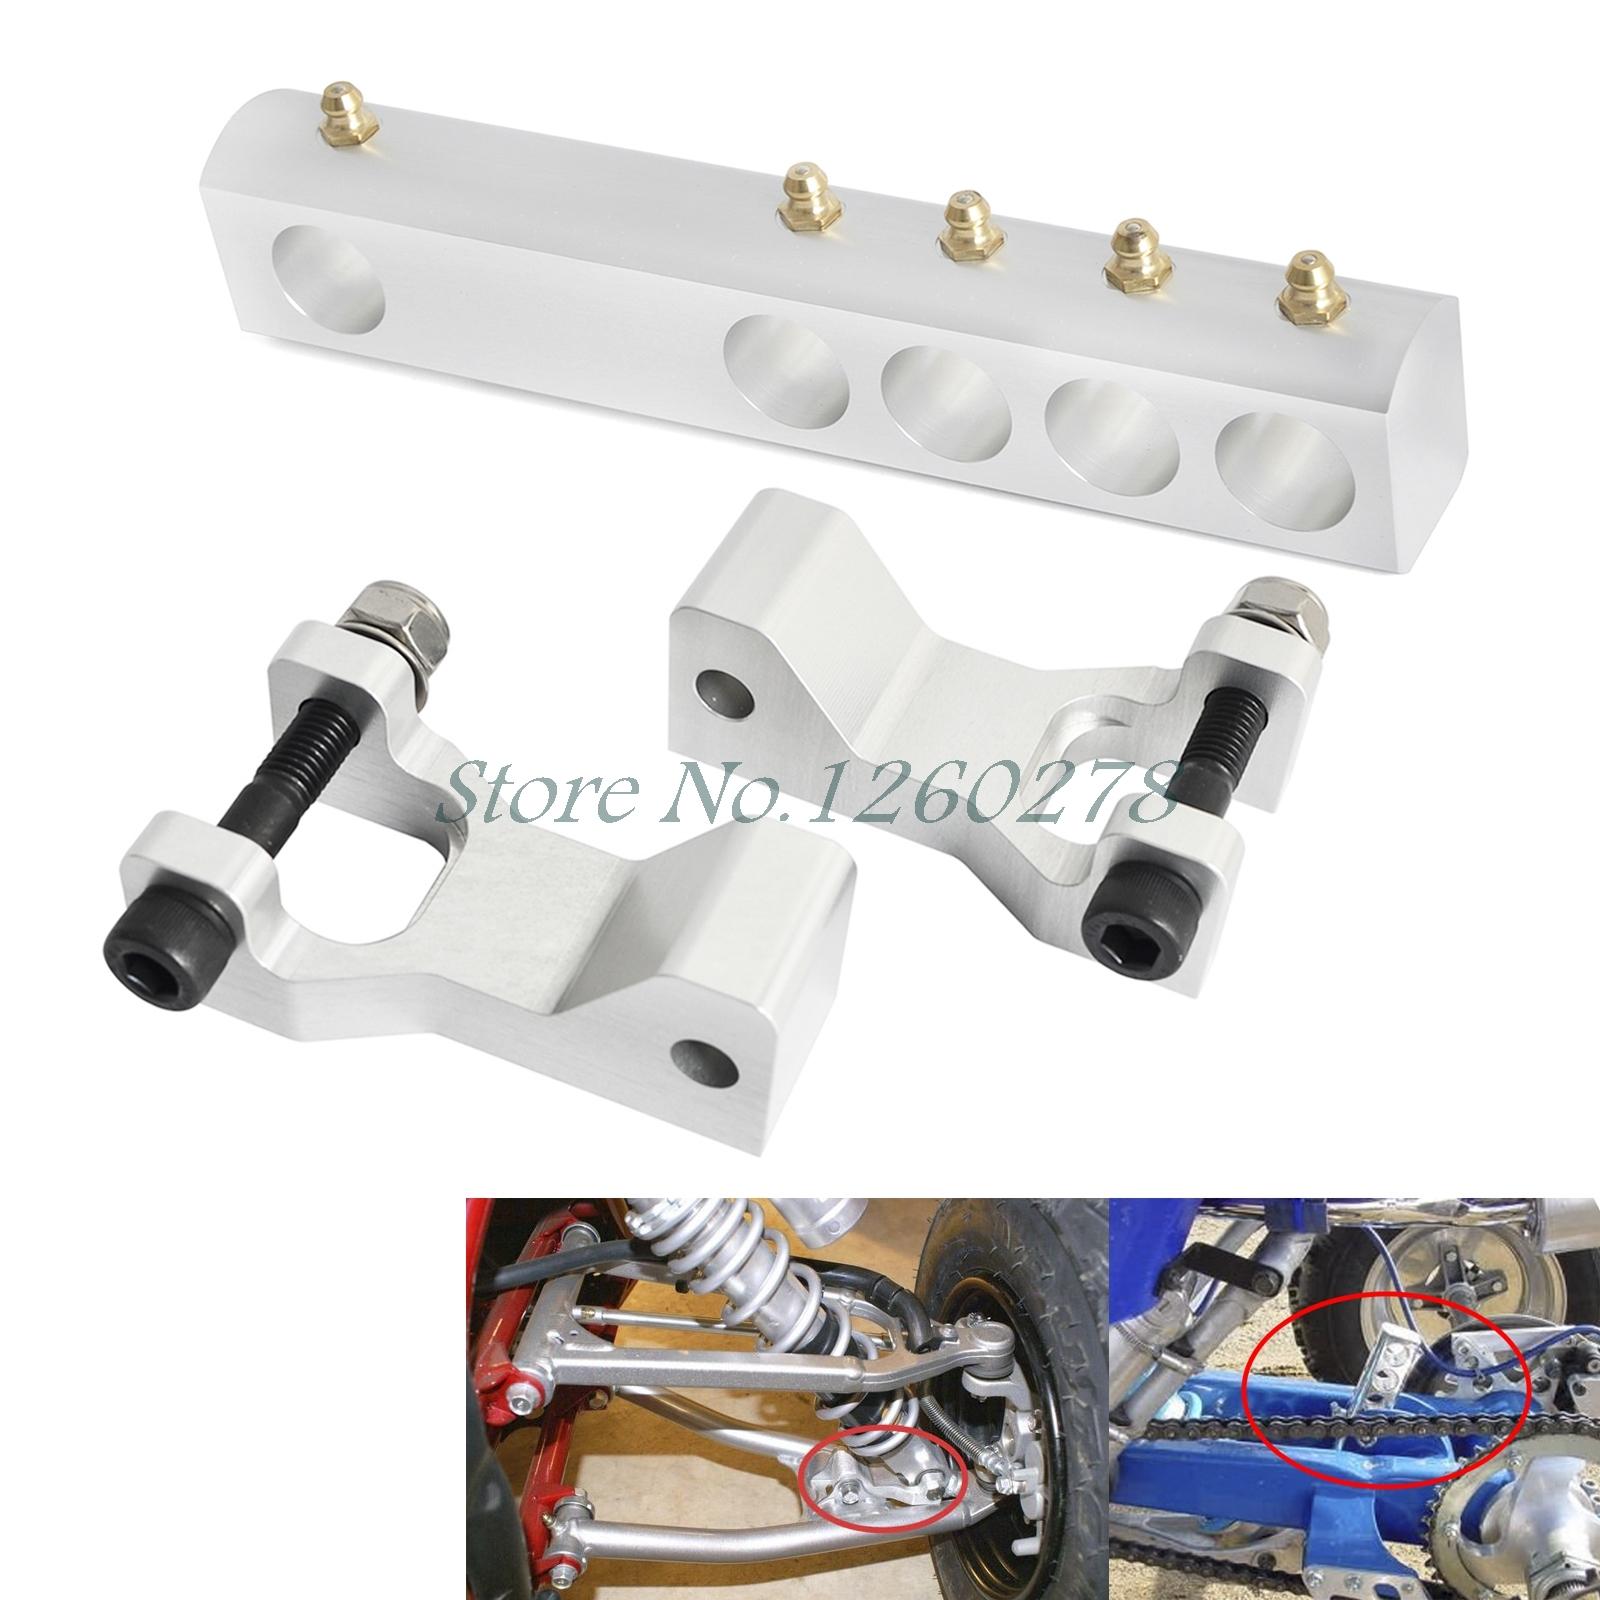 30x15 Clutch Variator Roller for Hisun 400//500//700cc ATV UTV Scooter Parts